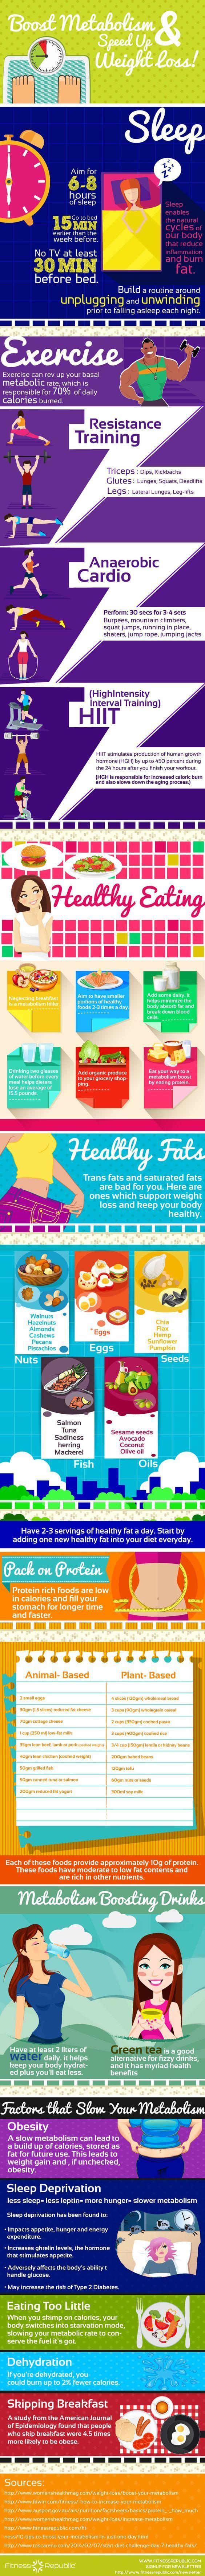 Boost Metabolism Lose Weight :: http://weight-loss-factory.com/ #animals #vitaminD #vitaminB #tagforlikes #L4L